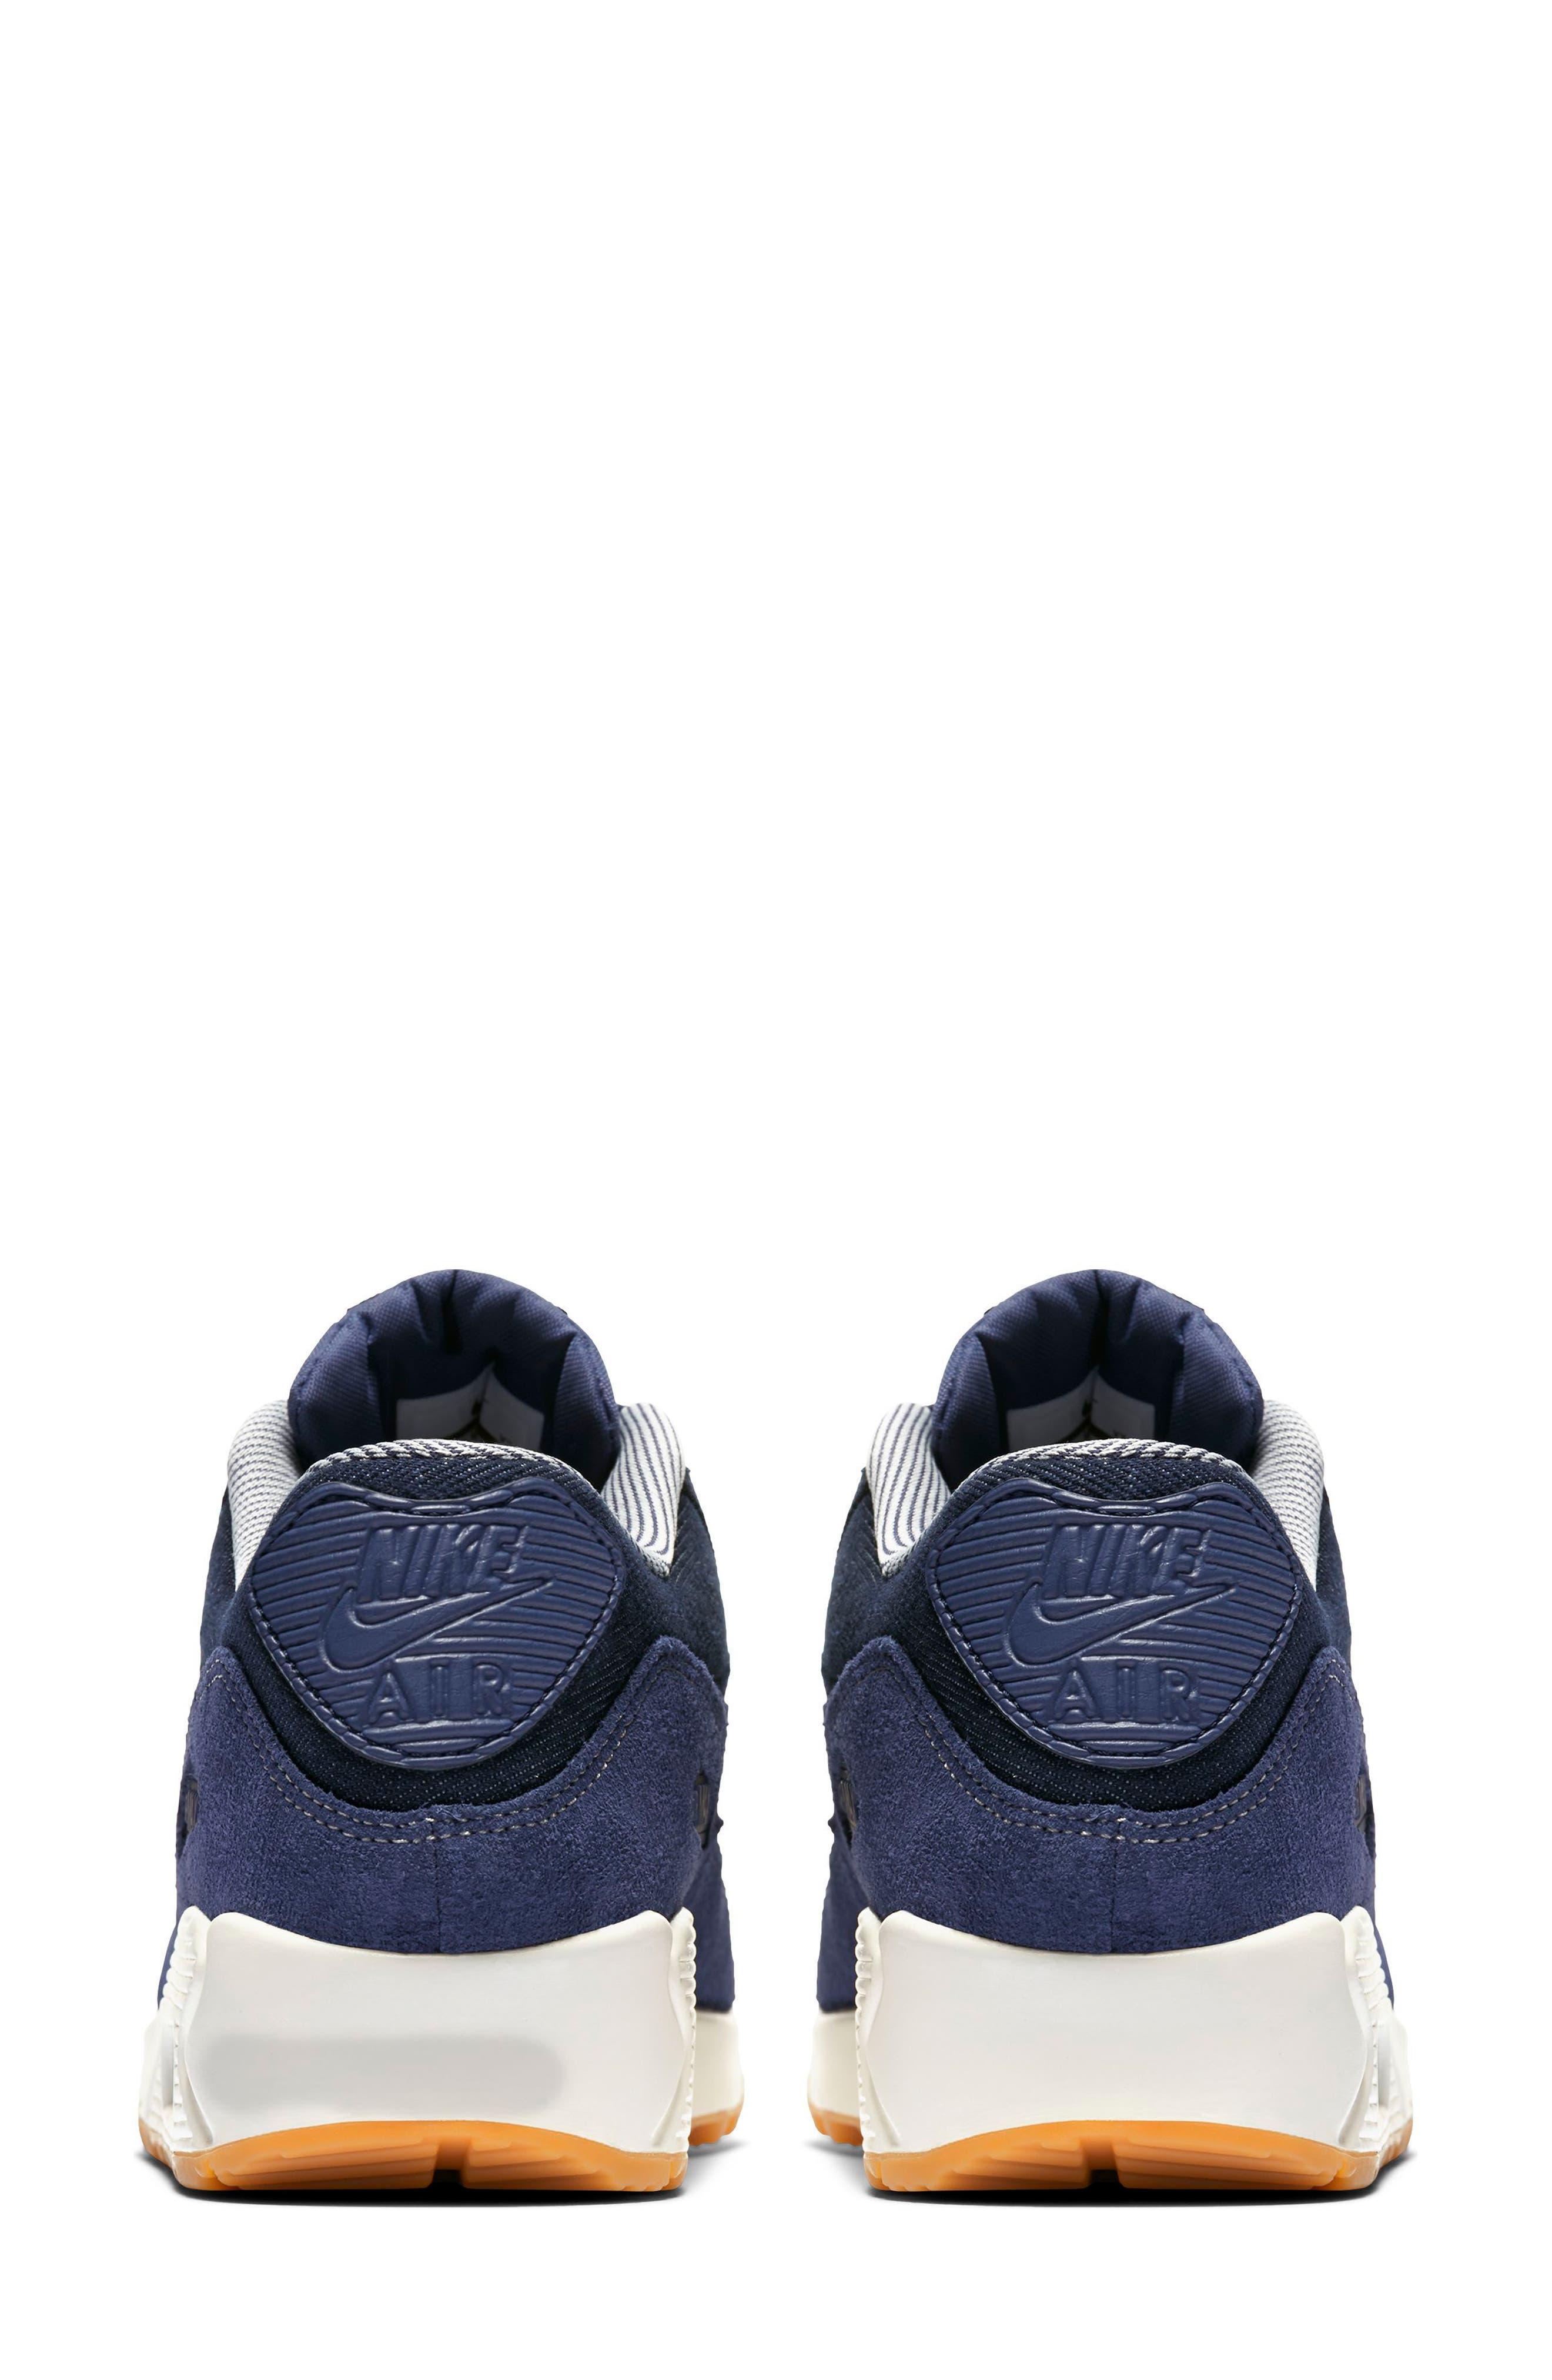 Air Max 90 SE Sneaker,                             Alternate thumbnail 16, color,